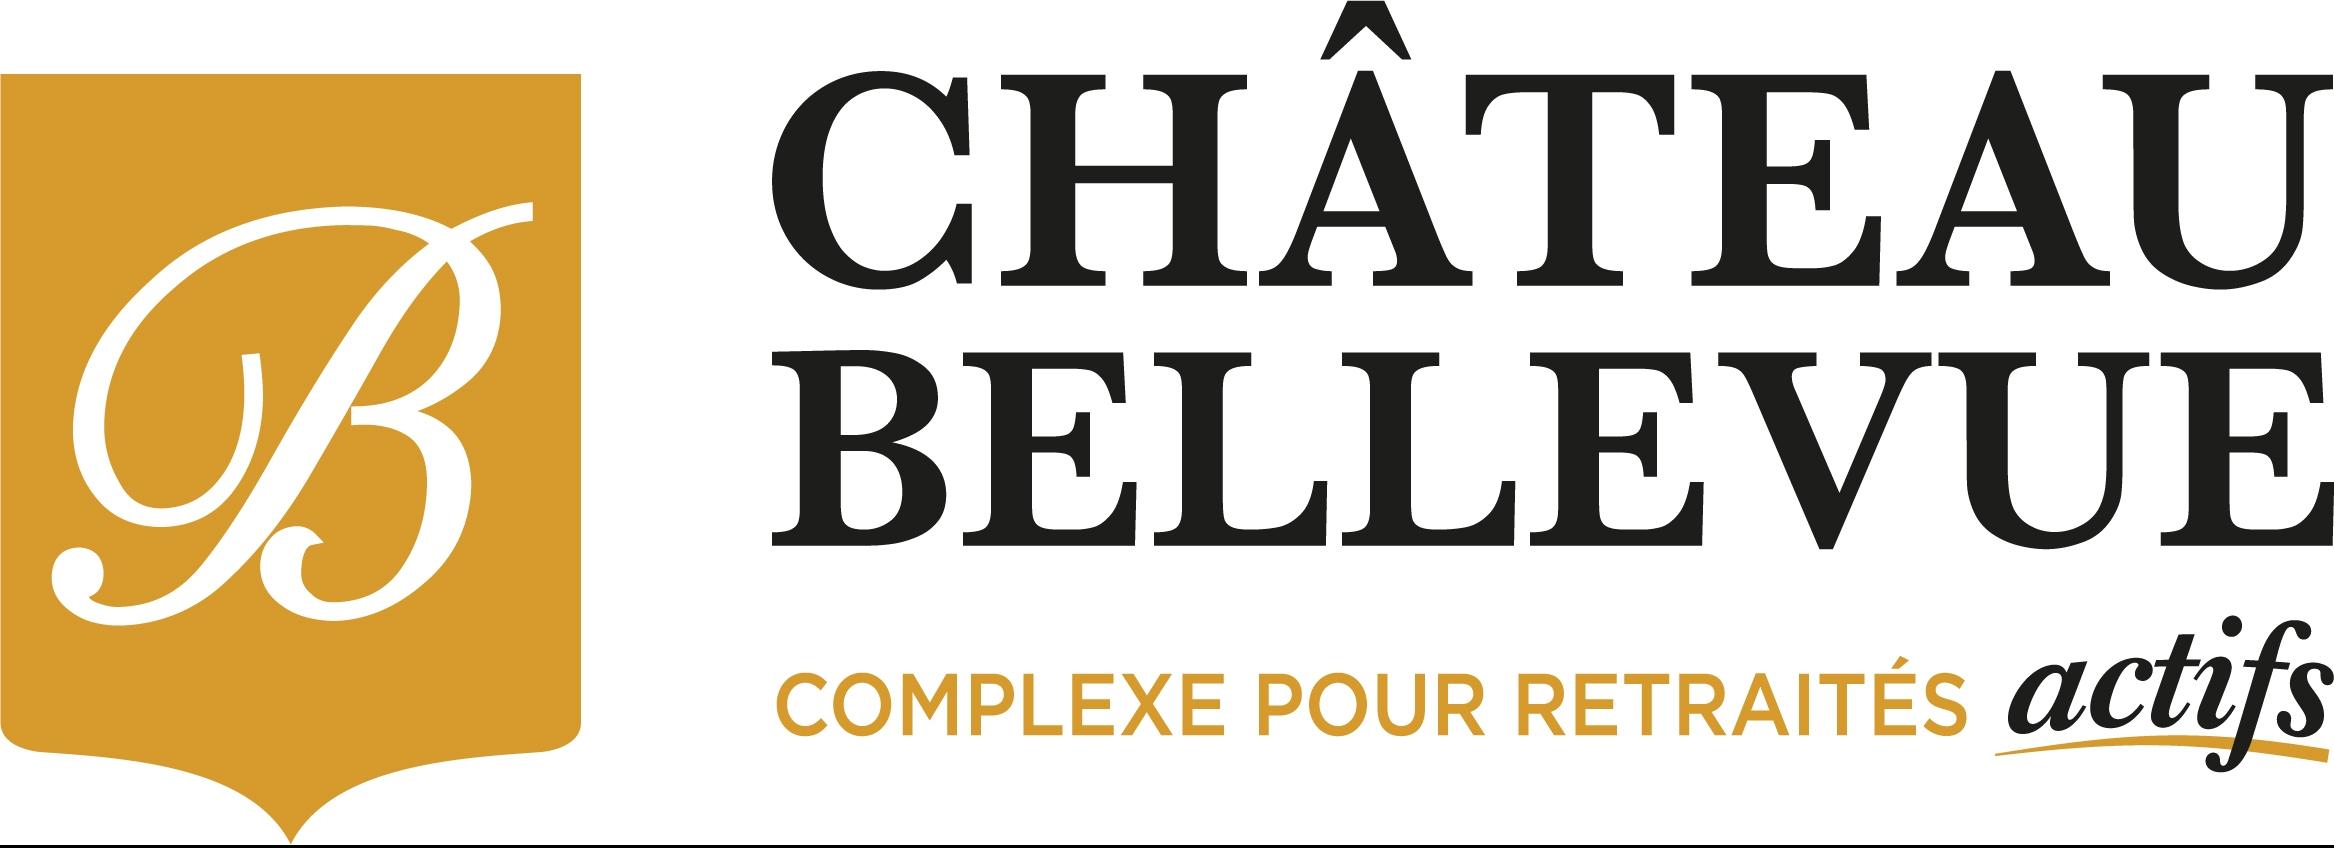 Château Bellevue de Thetford Mines